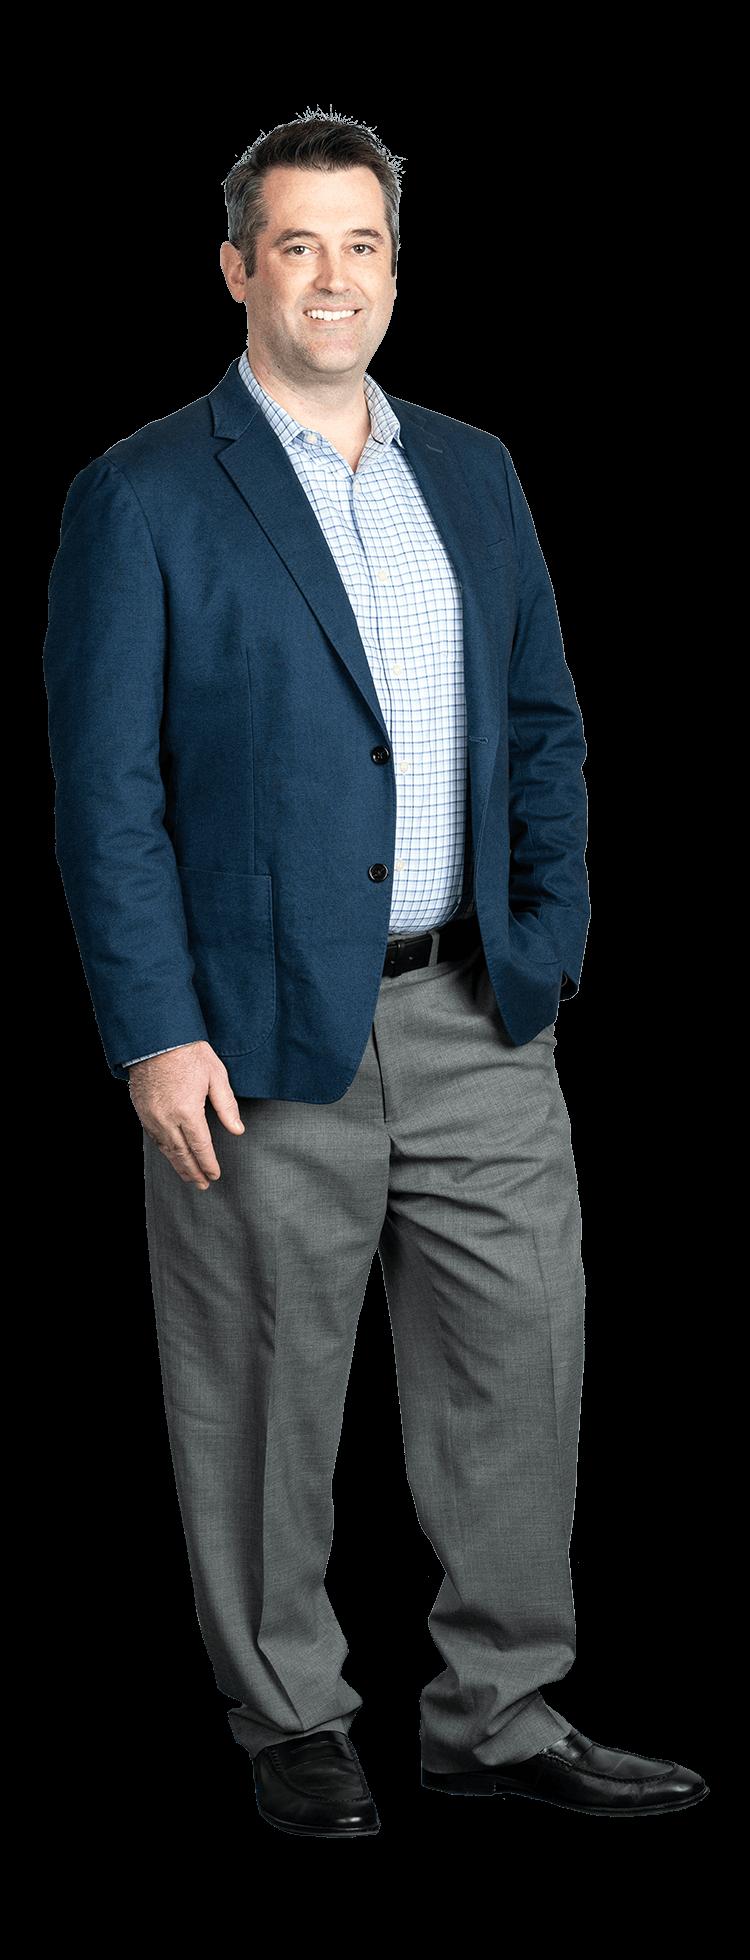 Clay Seese, Biotech team leader